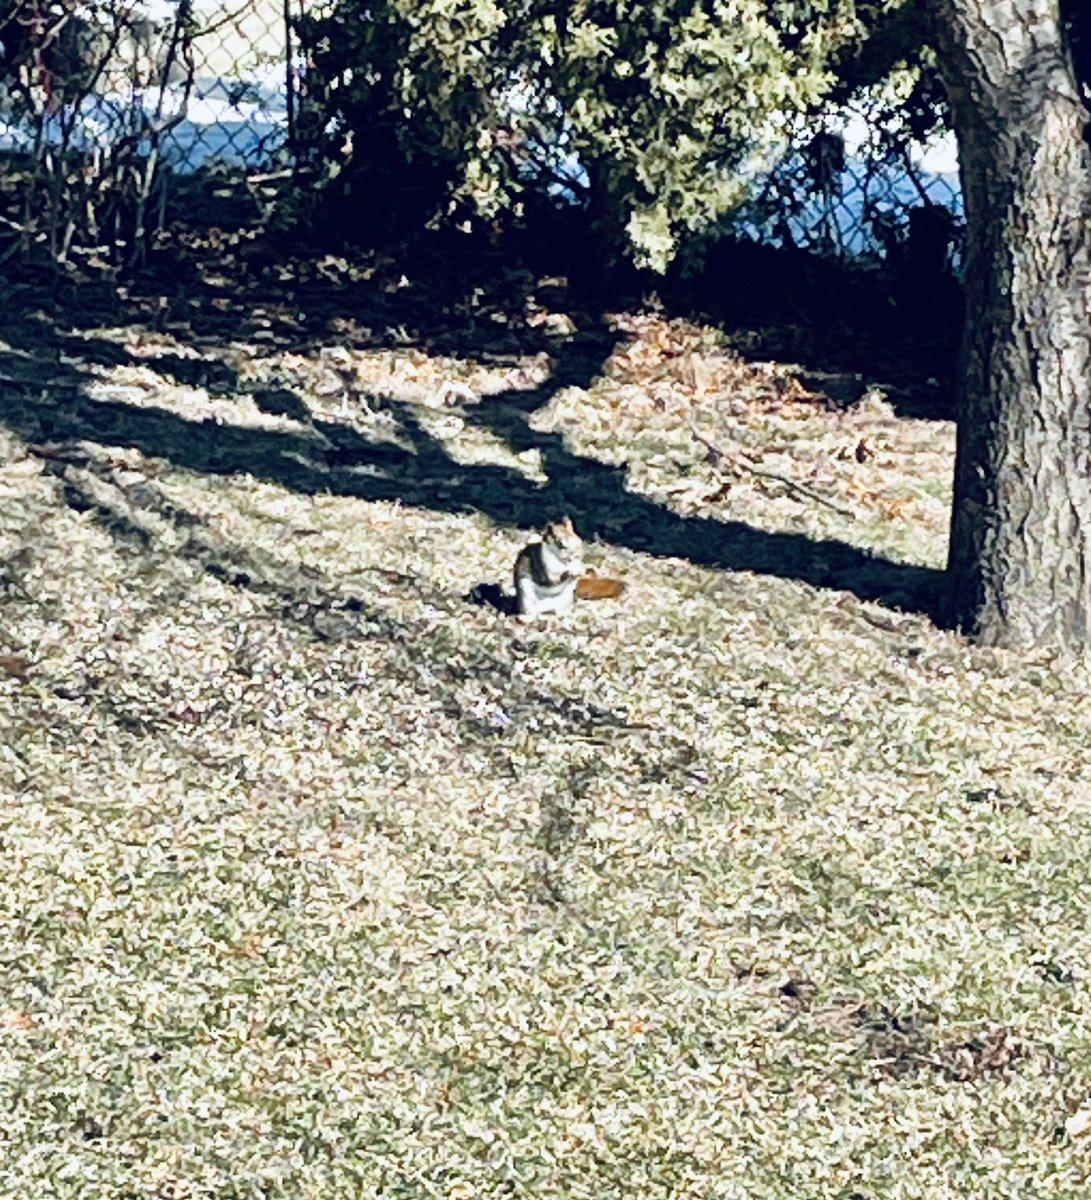 Little visitor #fridaymorning #FridayVibes